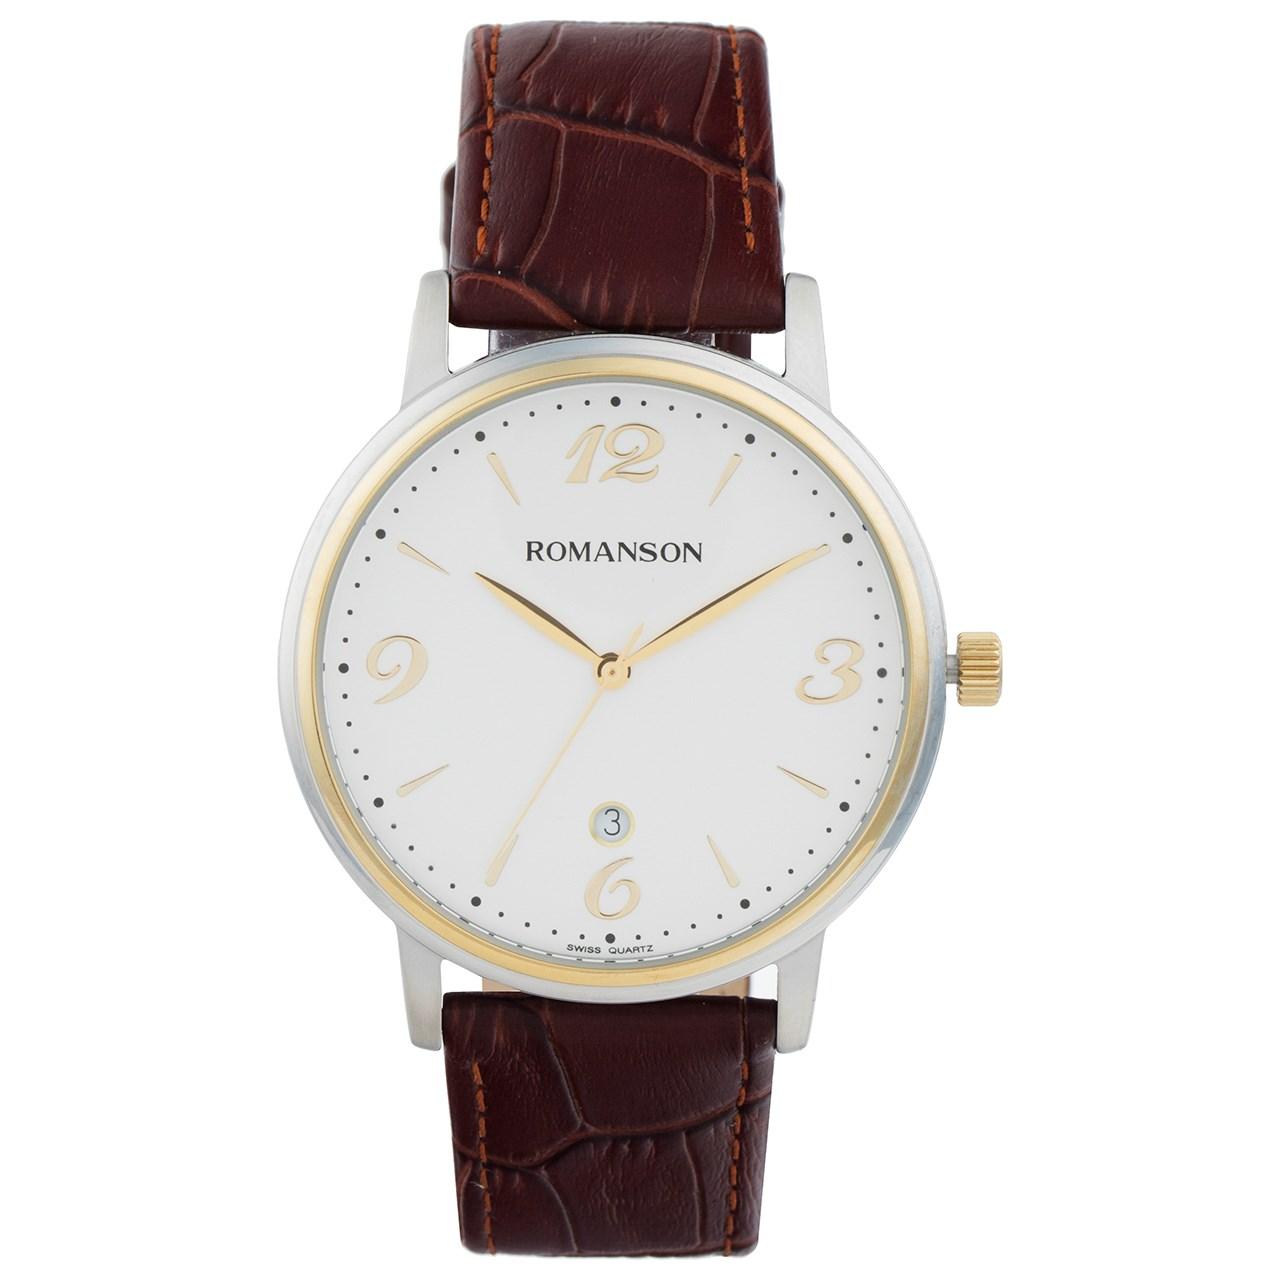 ساعت مچی عقربه ای مردانه رومانسون مدل TL4259MM1CA11G 28